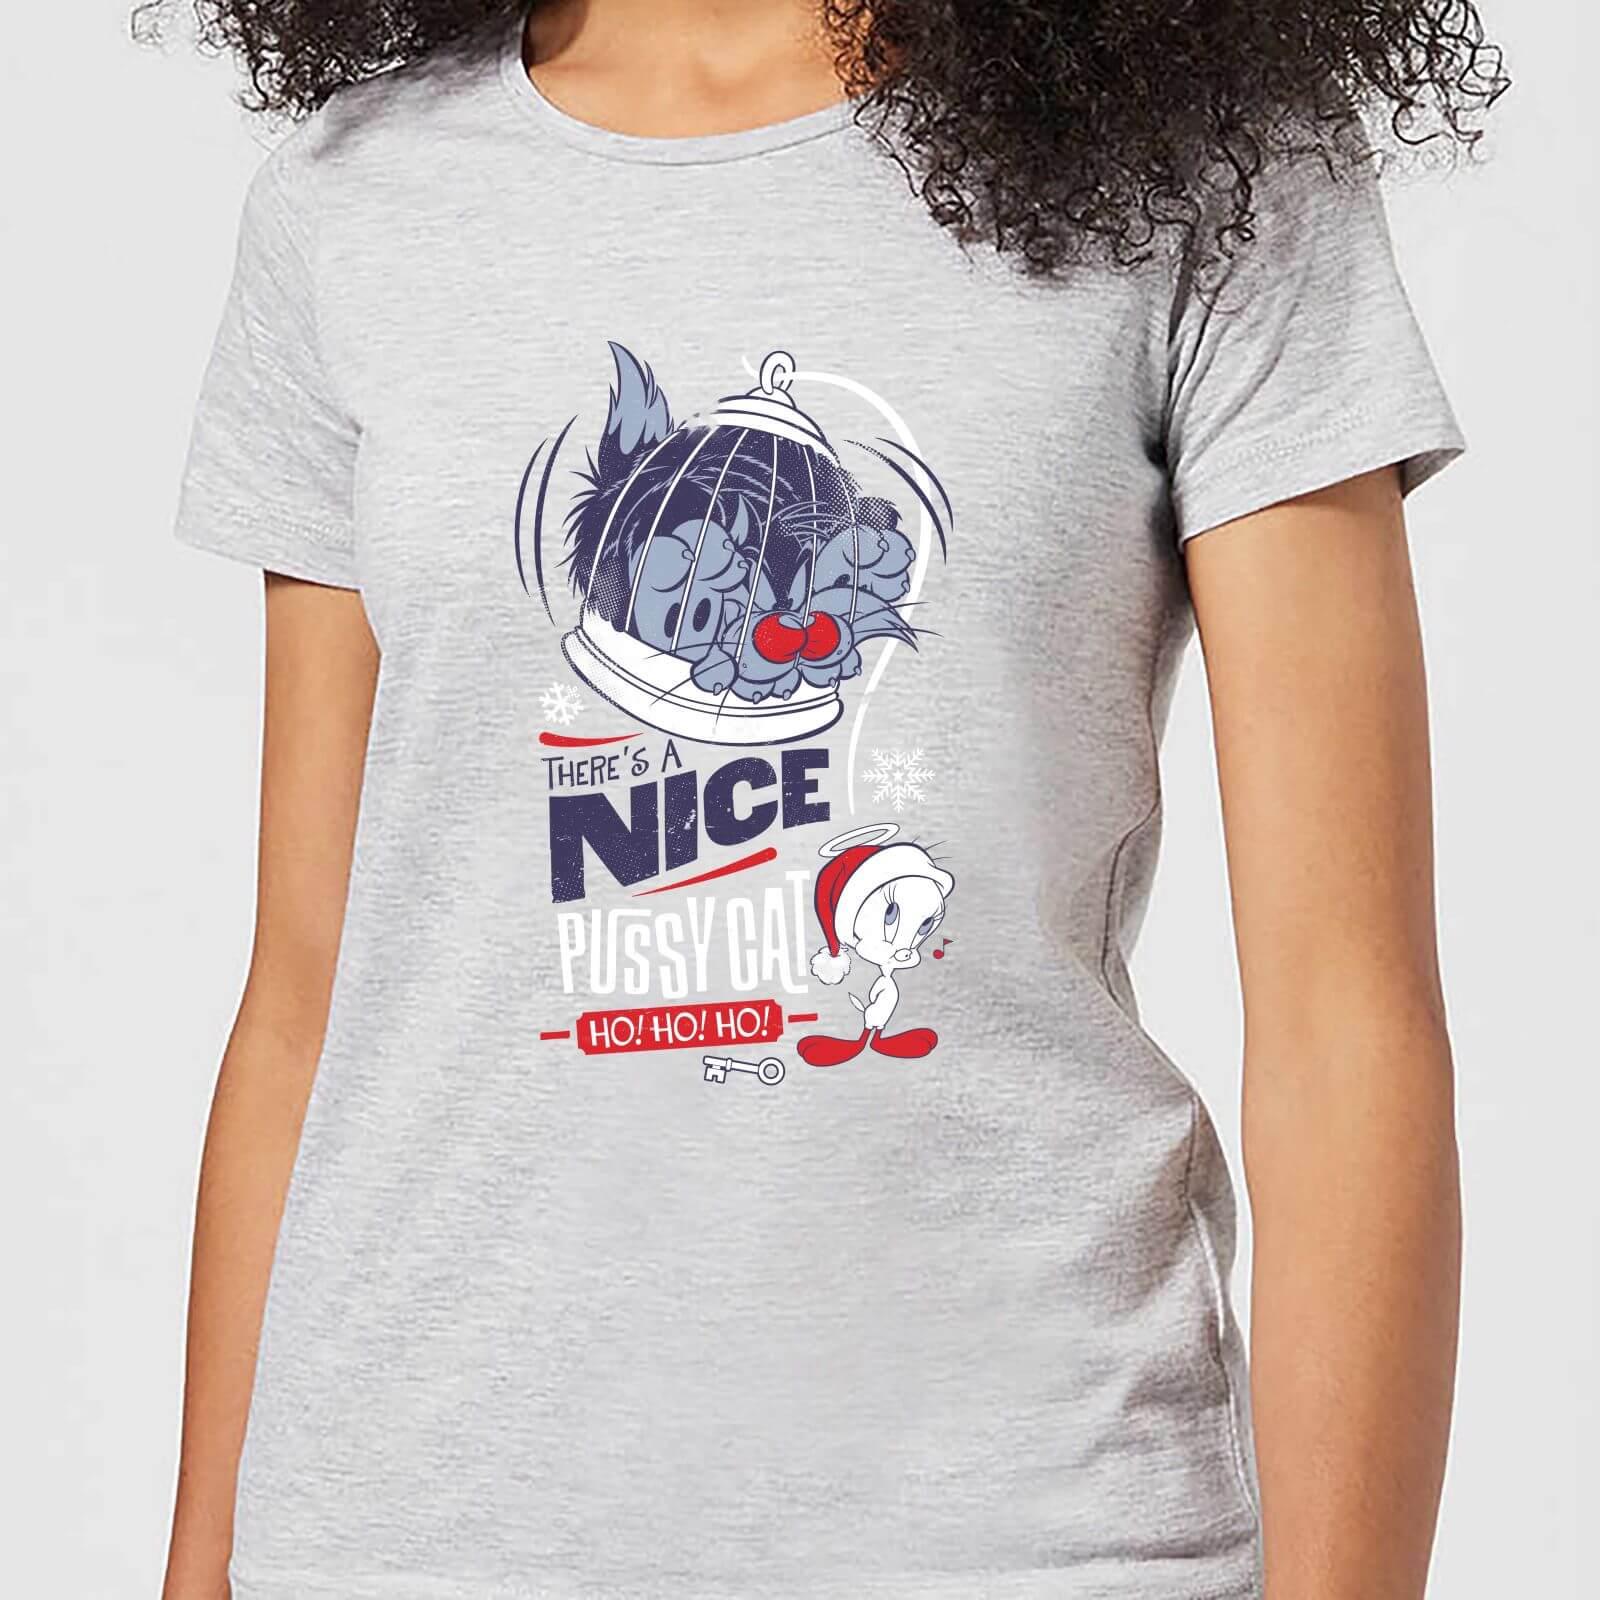 Looney Tunes Tweety Pie Pussy Cat Women's Christmas T-Shirt - Grey - 5XL - Grey